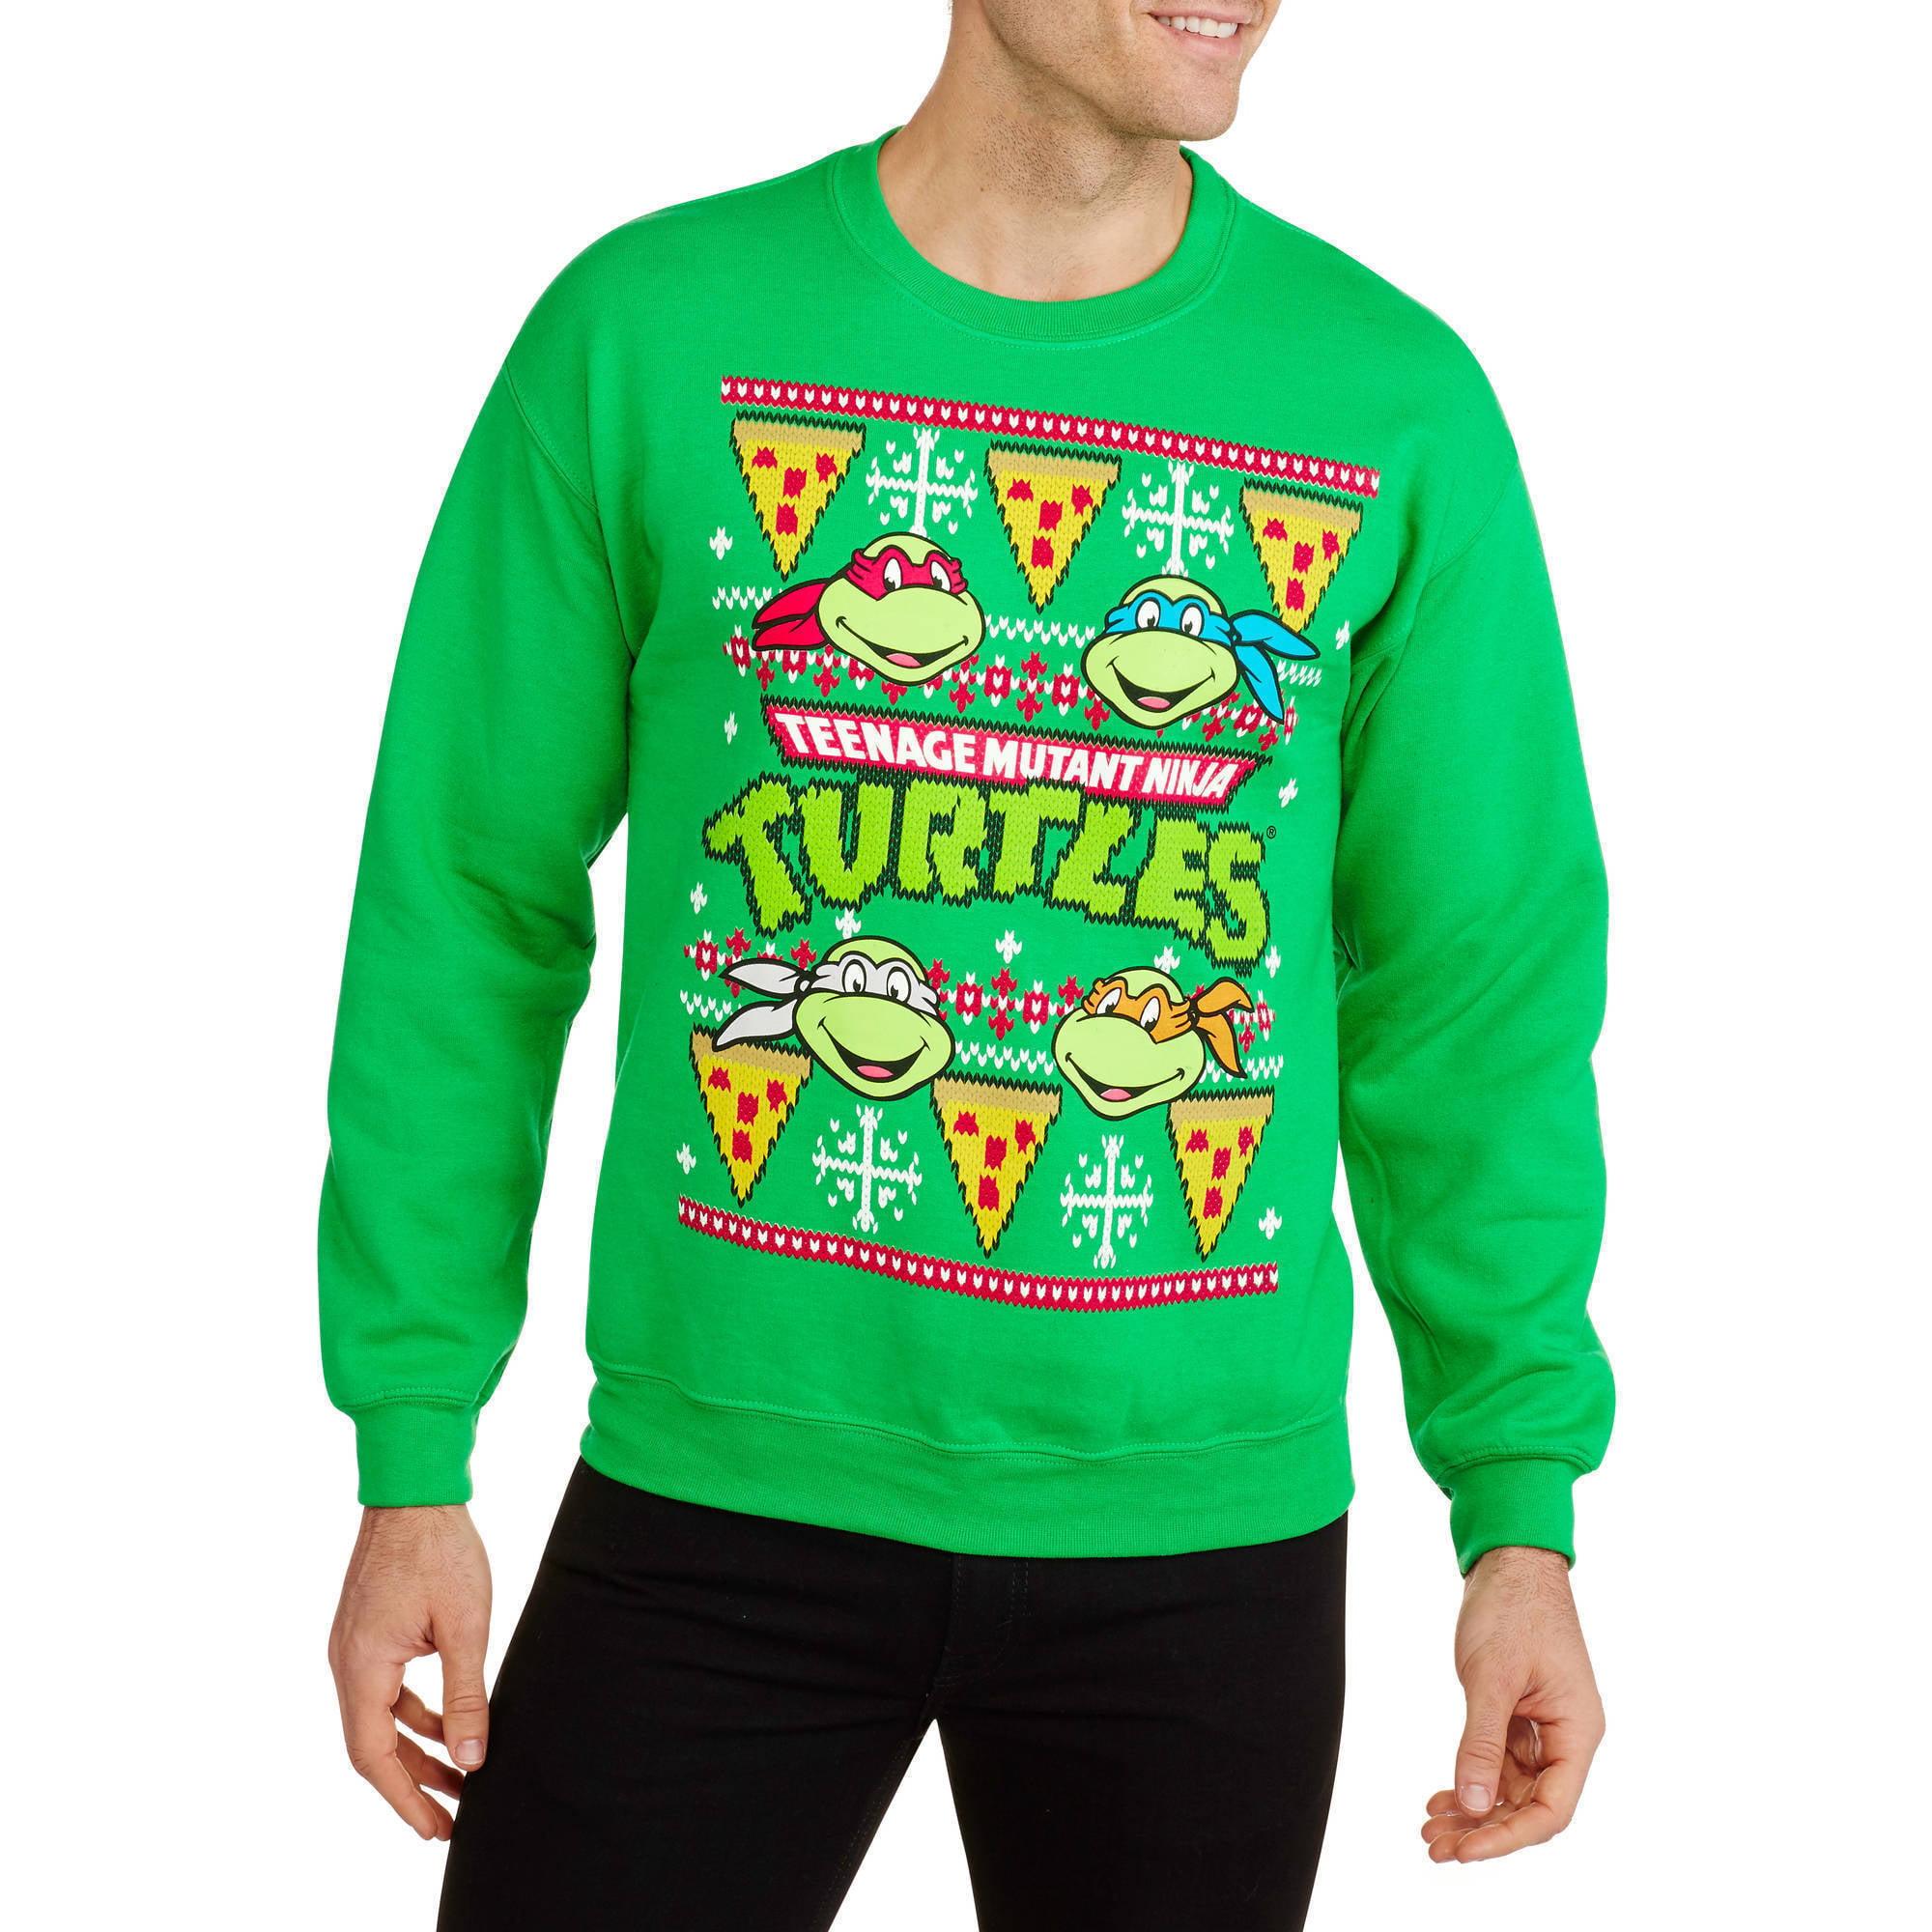 Teenage Mutant Ninja Turtles - Pizza Ugly Christmas Men\'s Graphic ...